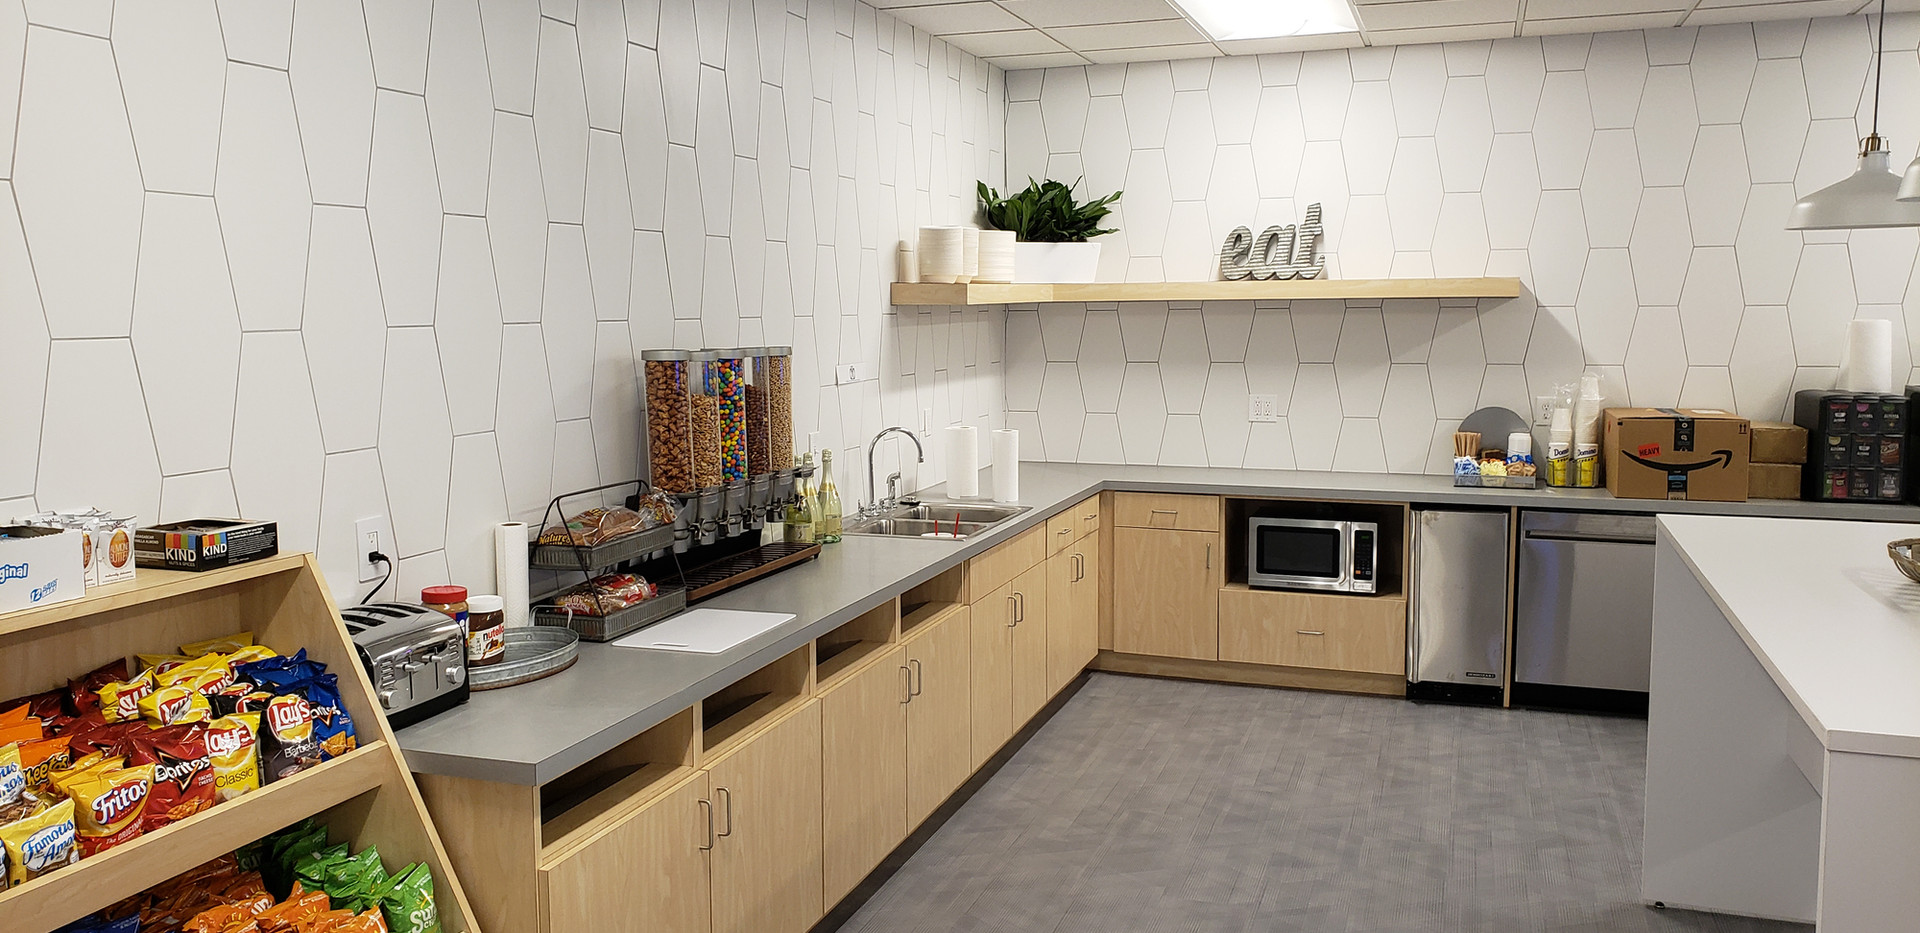 Office Kitchen - Buildout Pros